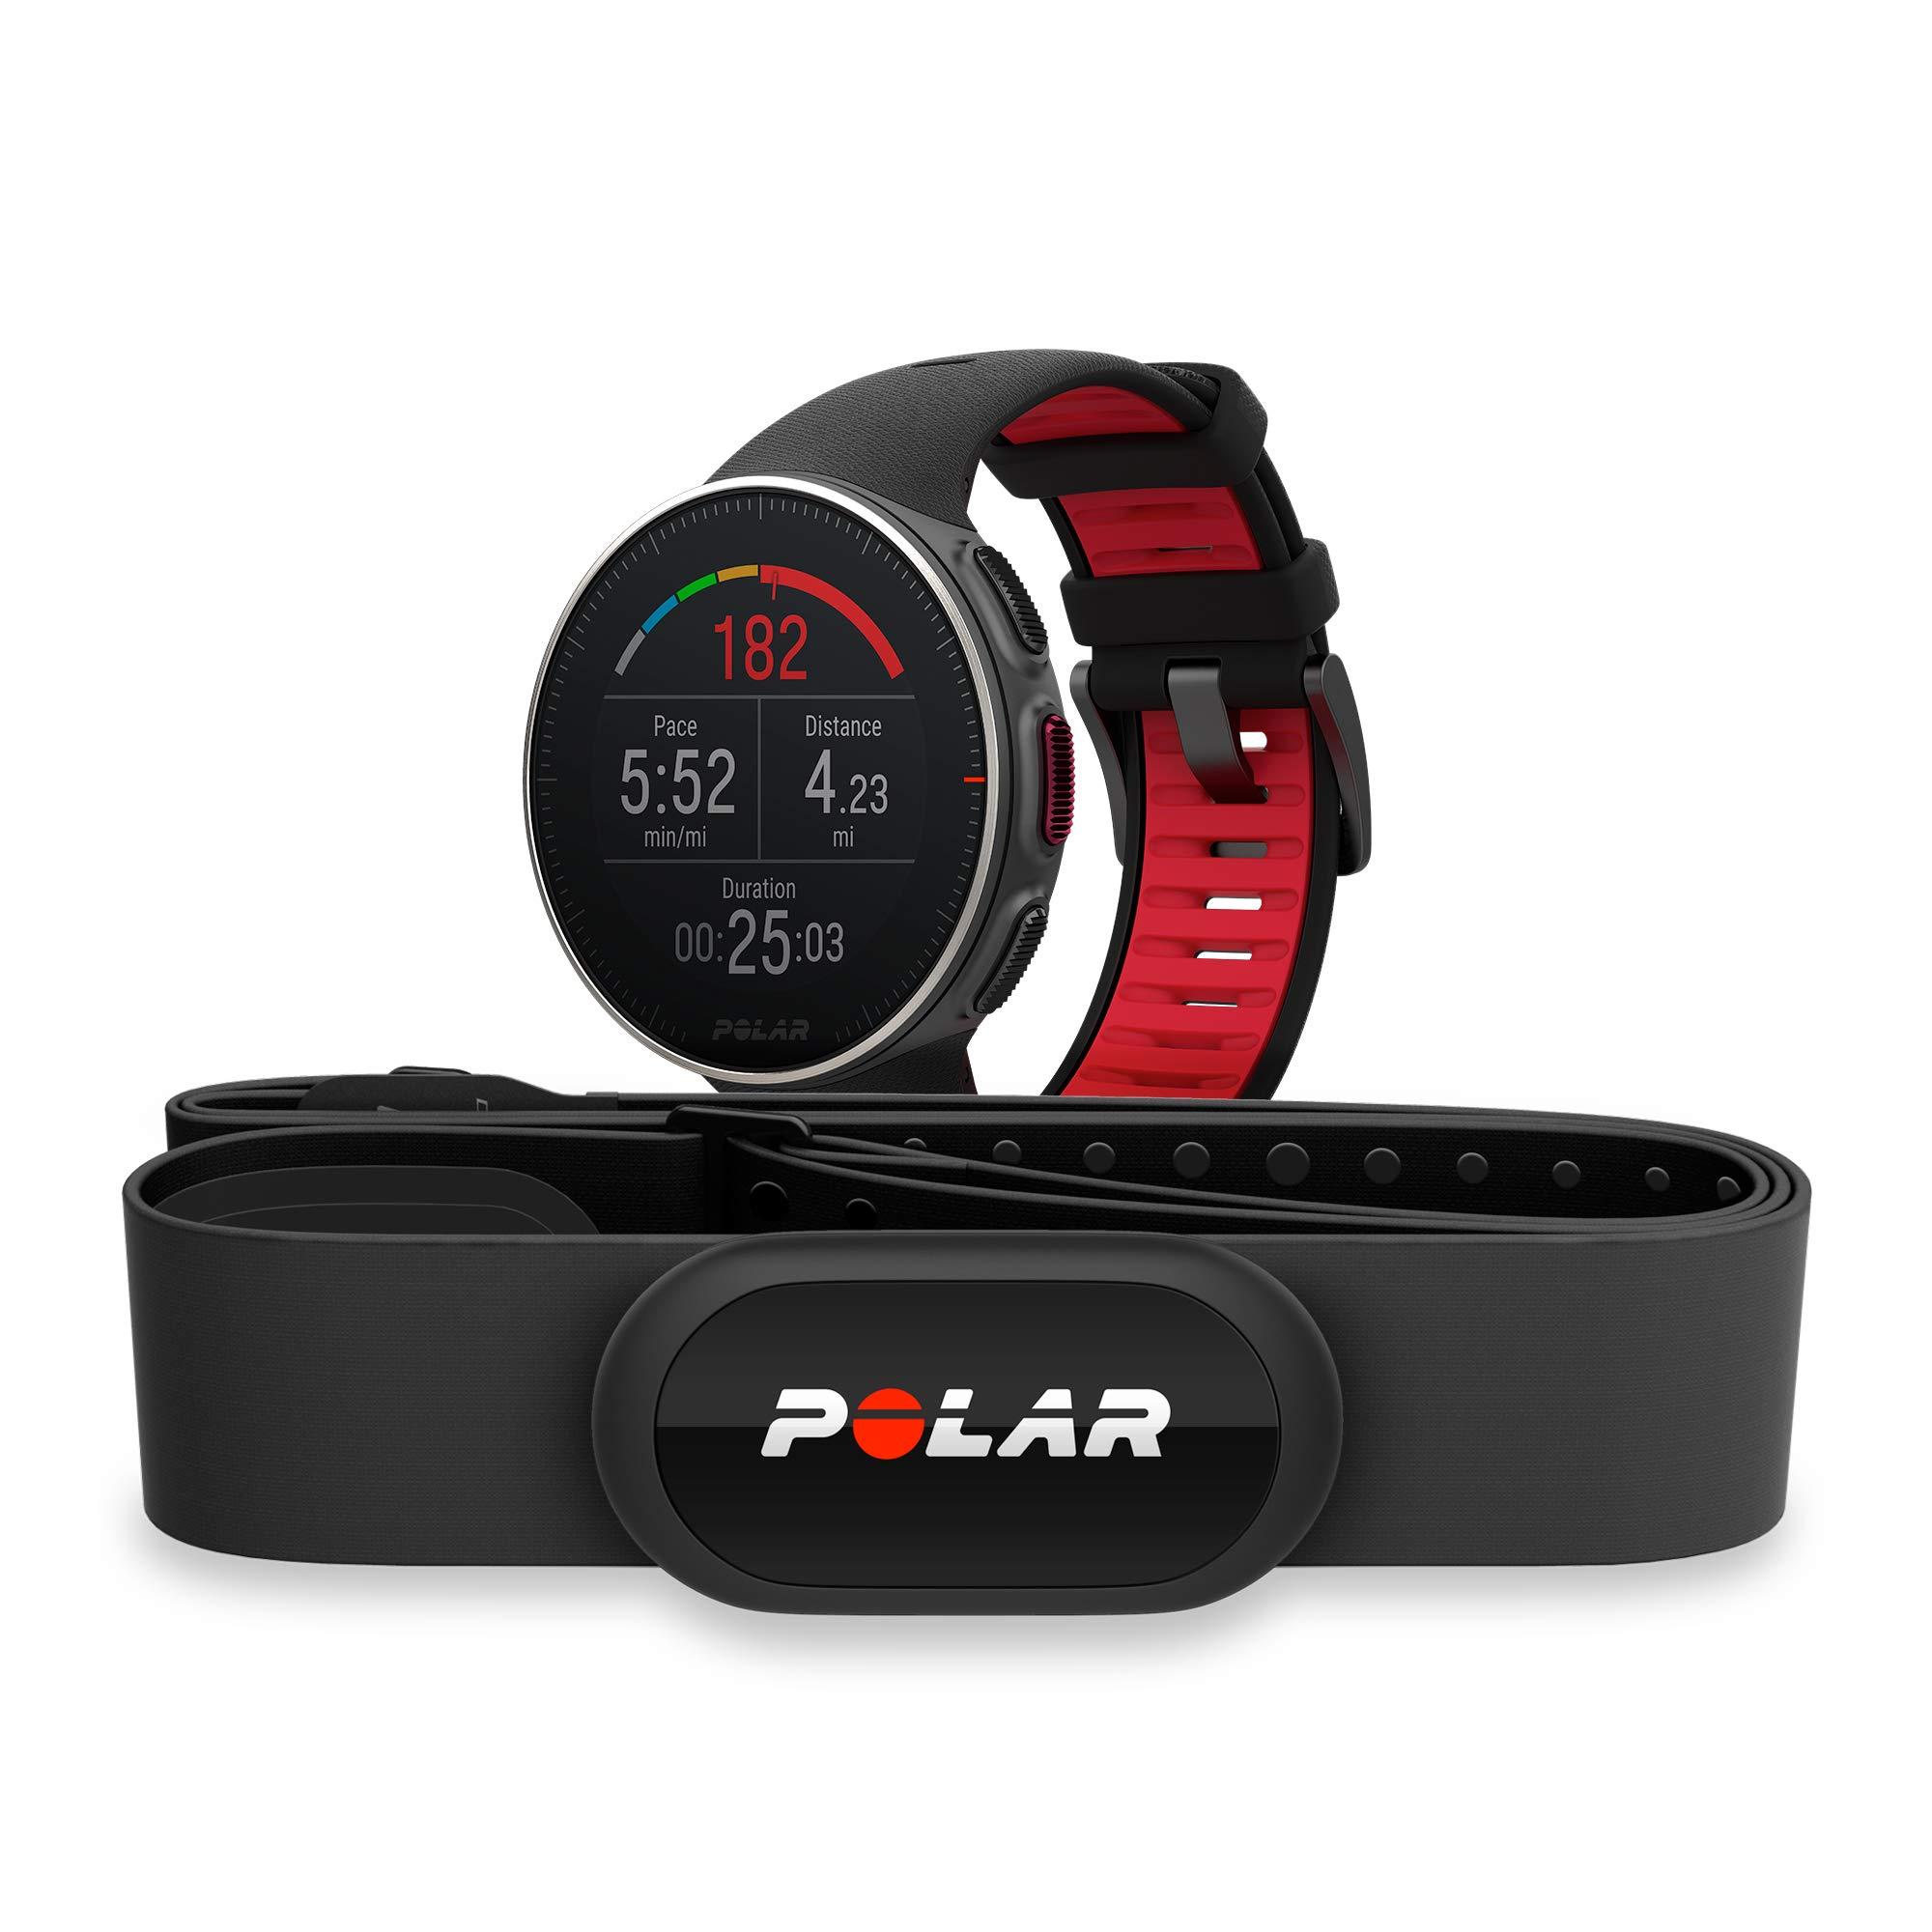 Polar Vantage V Titan, Advanced GPS Multisport Watch with H10 HRM Chest Strap for Multisport and Triathlon Training, (HRM, Running Power, Waterproof)